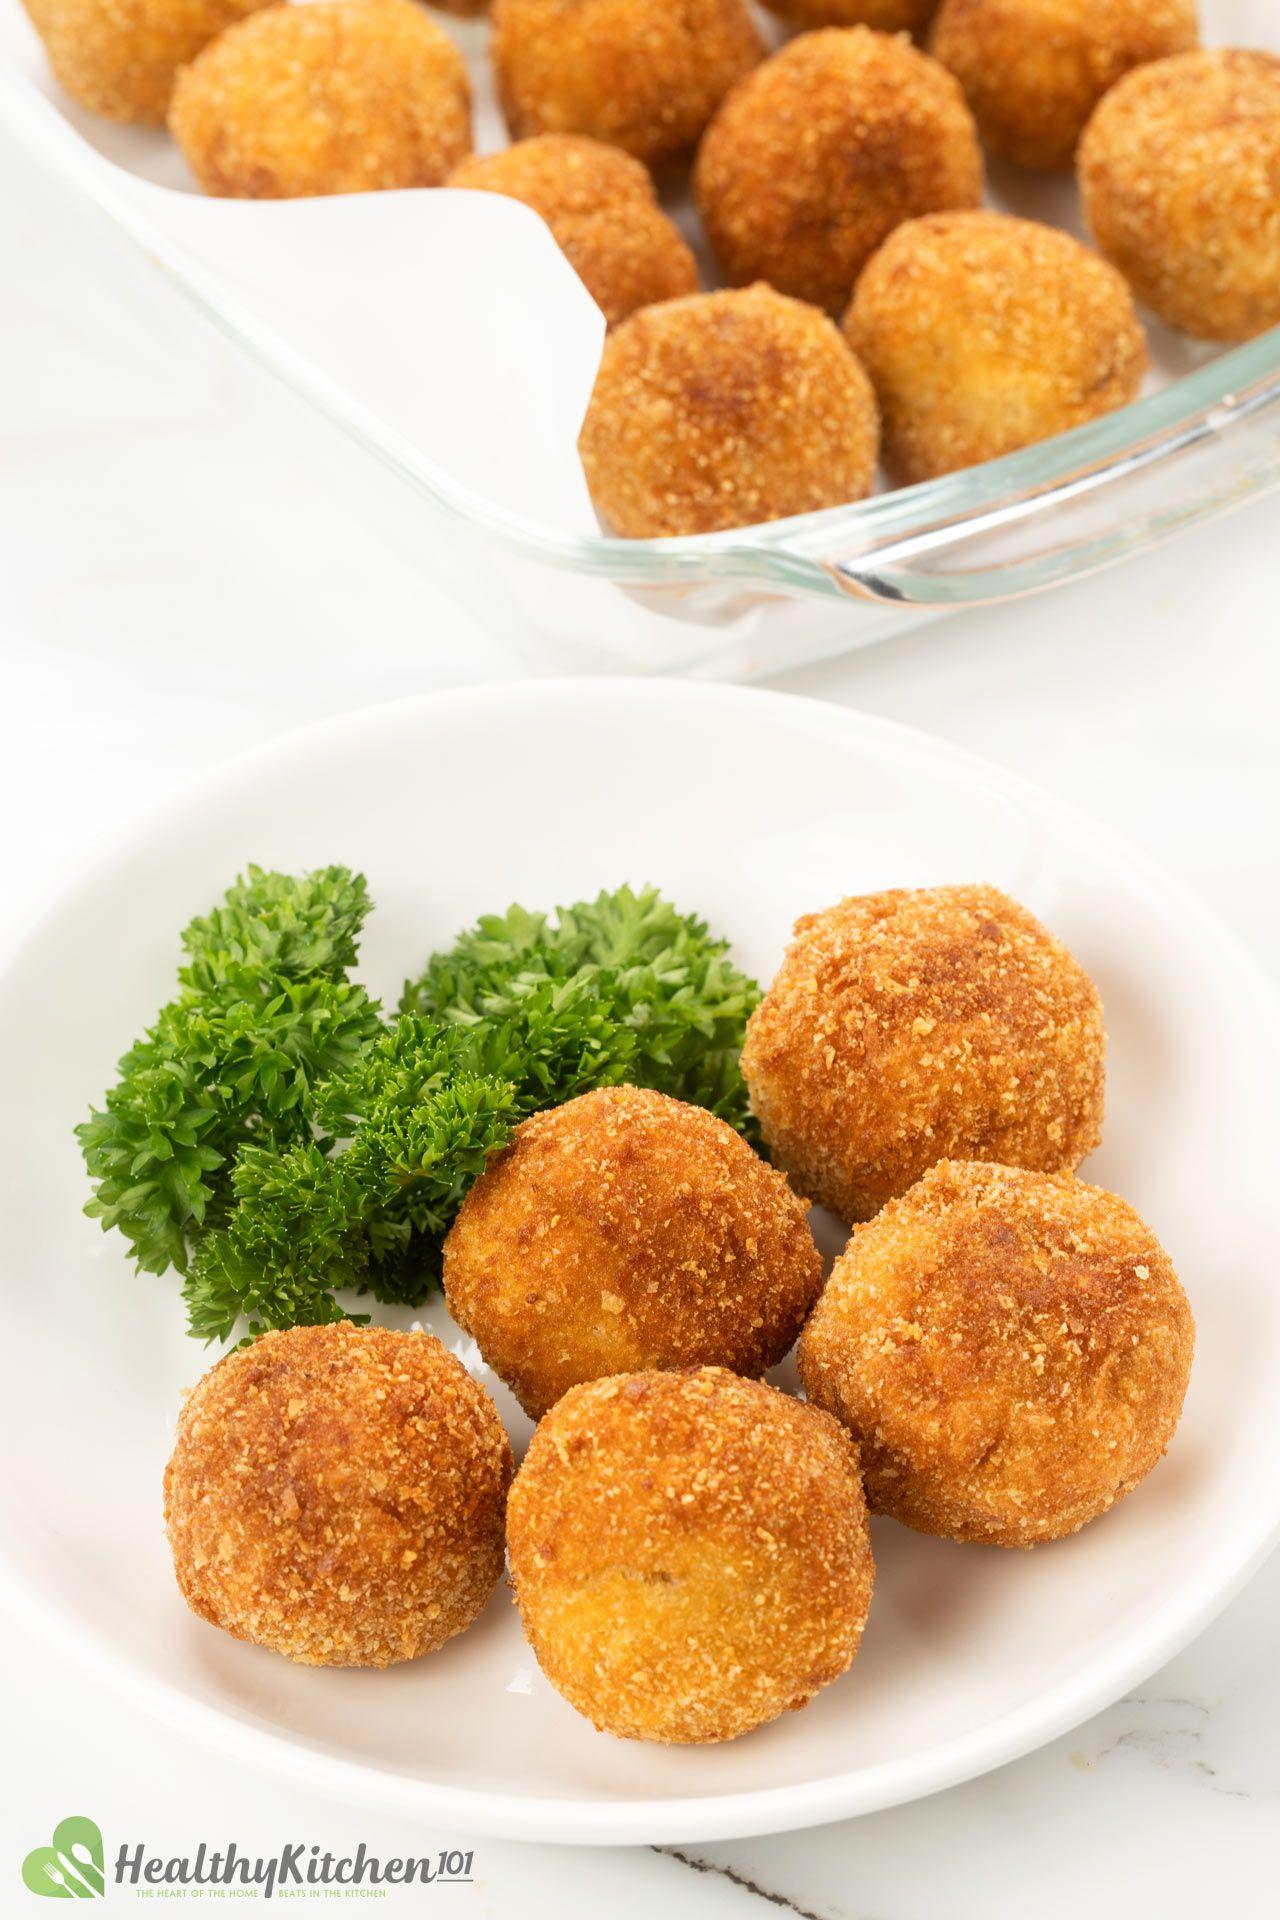 Homemade Arancini Recipe Rice balls